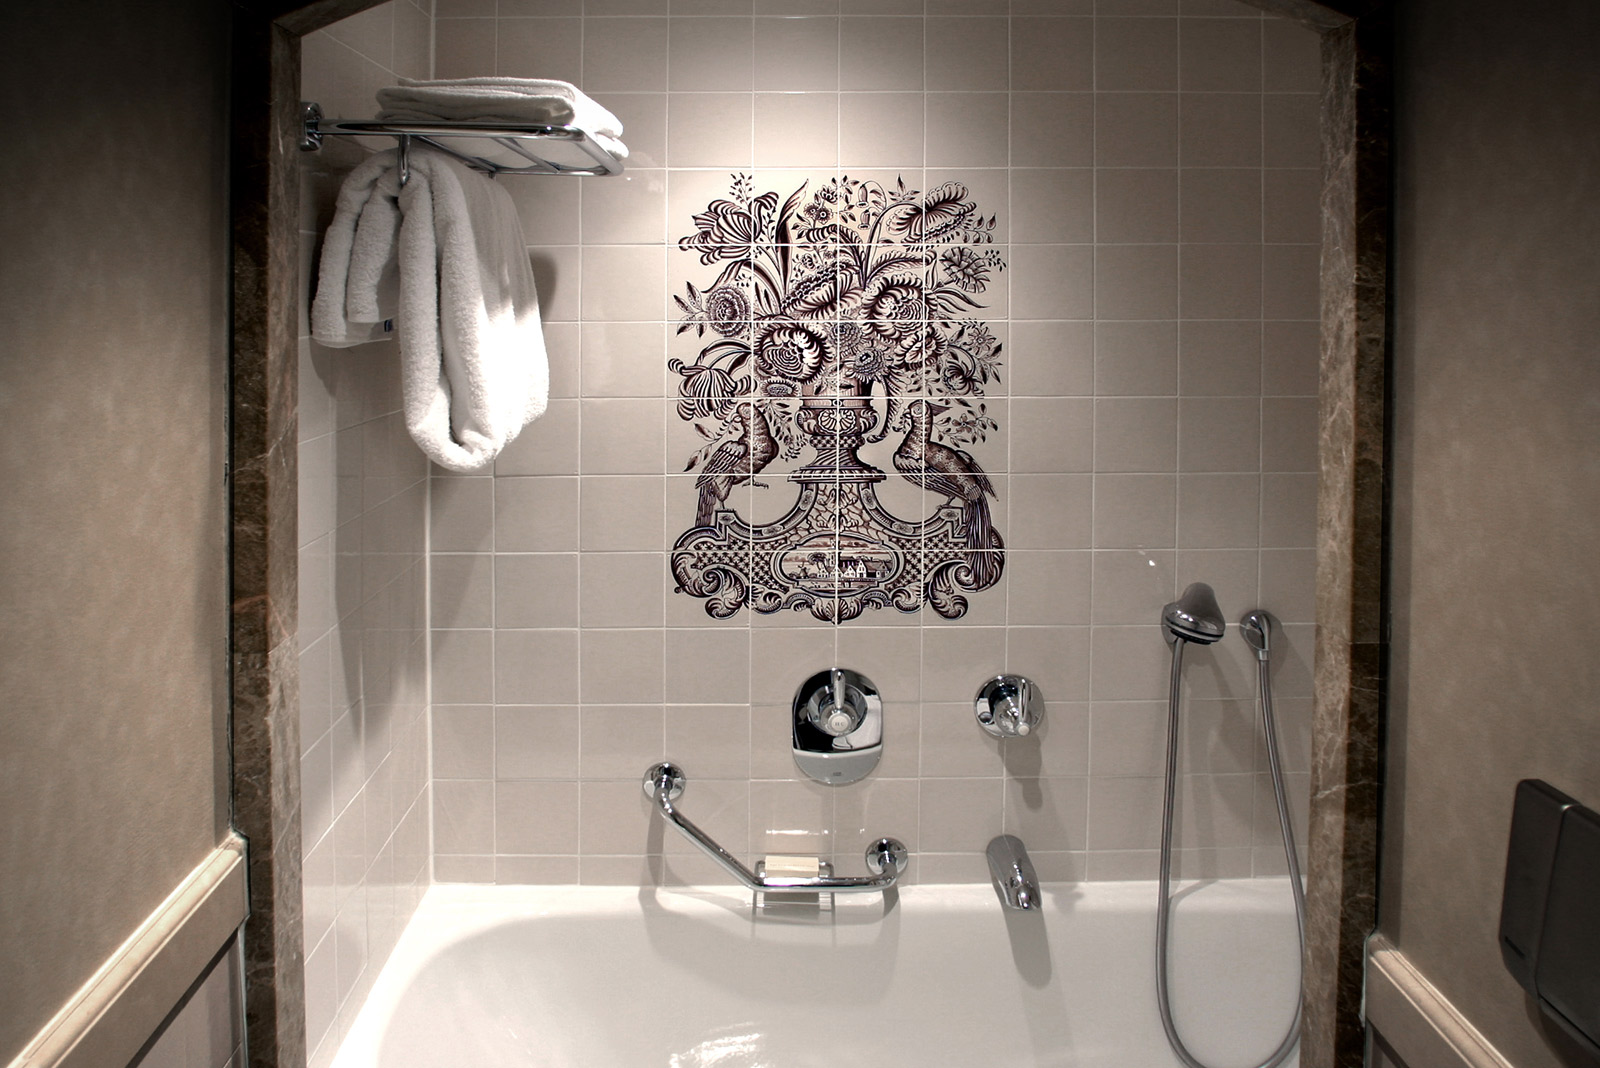 Badkamer Tegels Amsterdam : 265 tableaus voor het pulitzer hotel in amsterdam